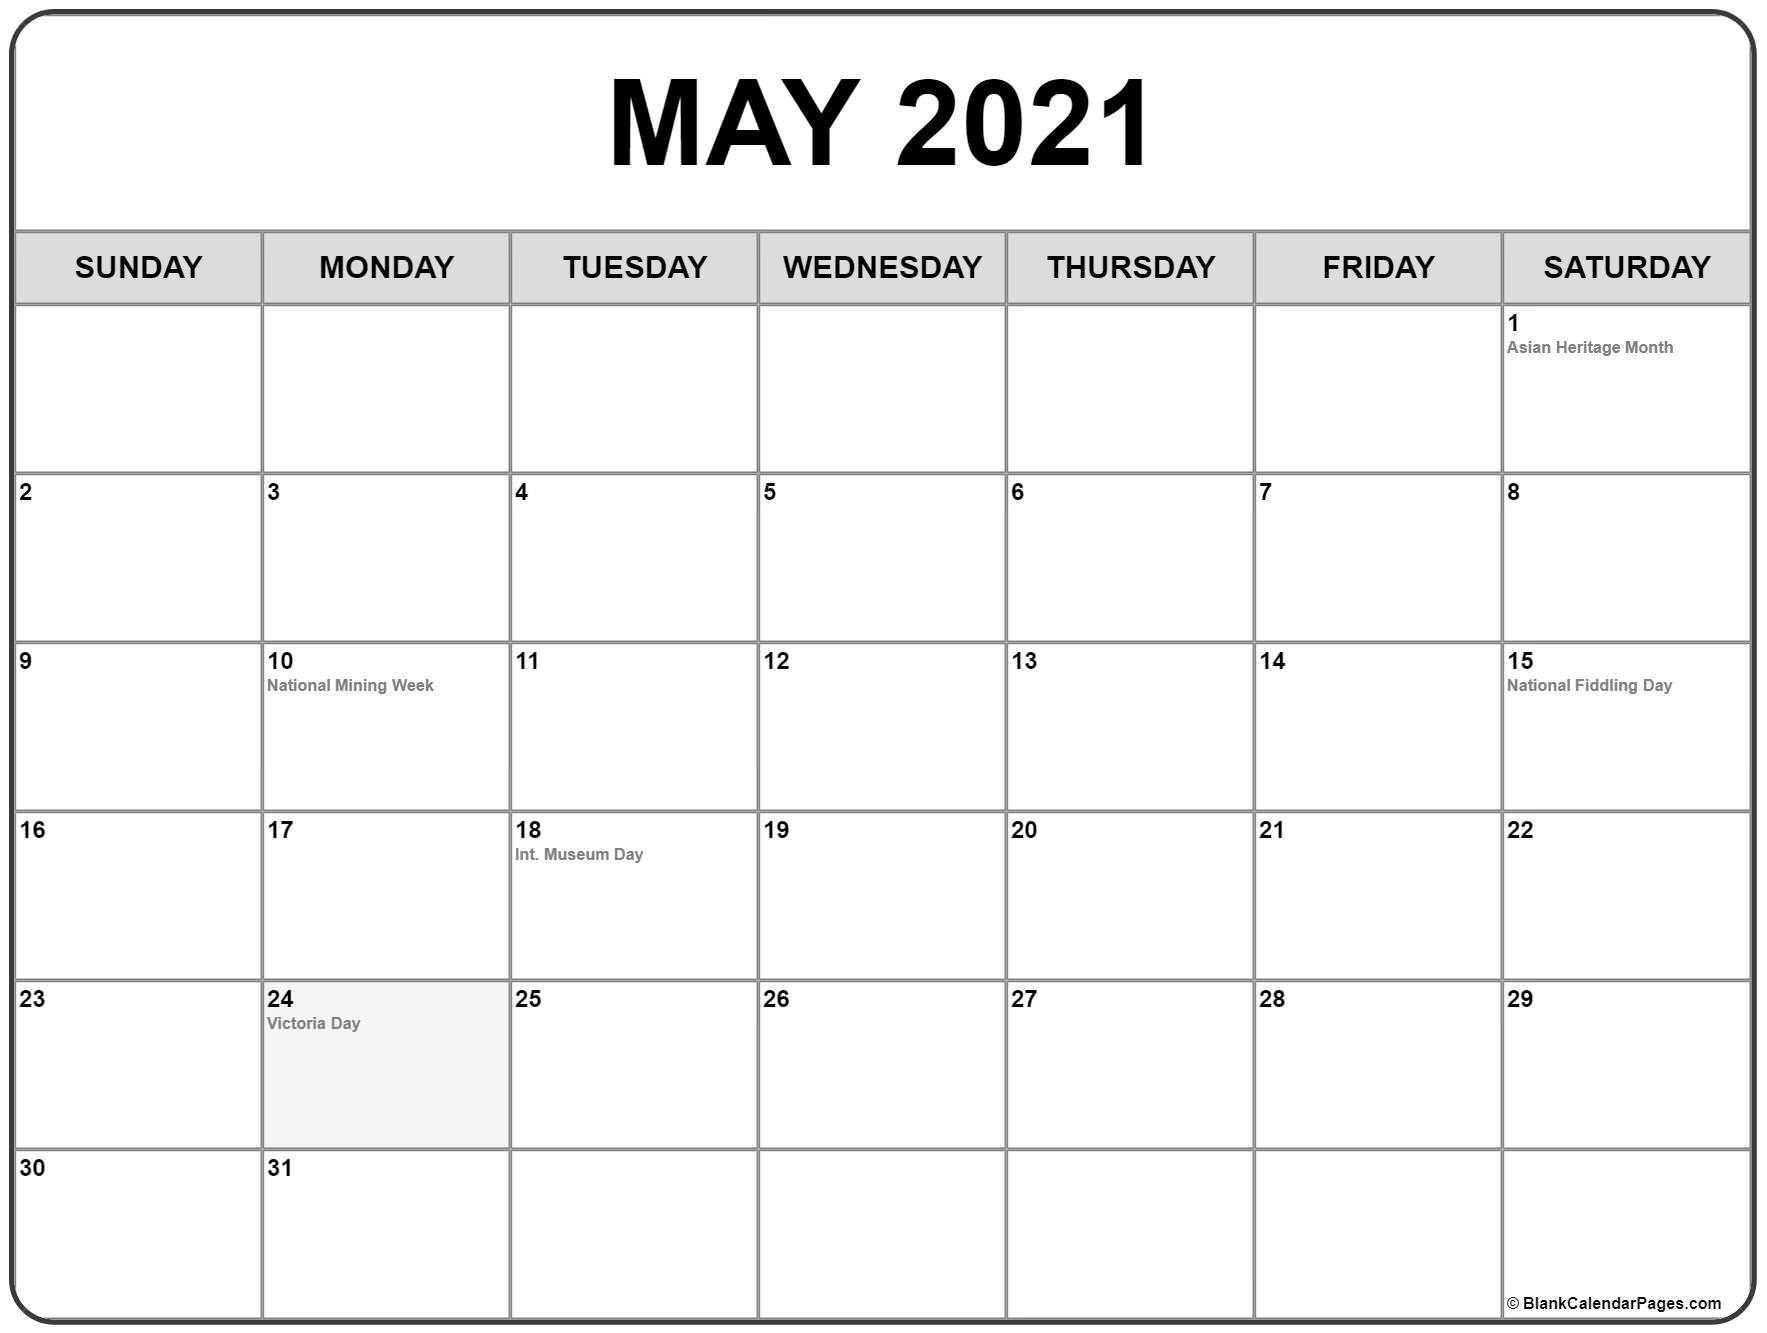 Printable 2021 Canadian Holiday Calendar